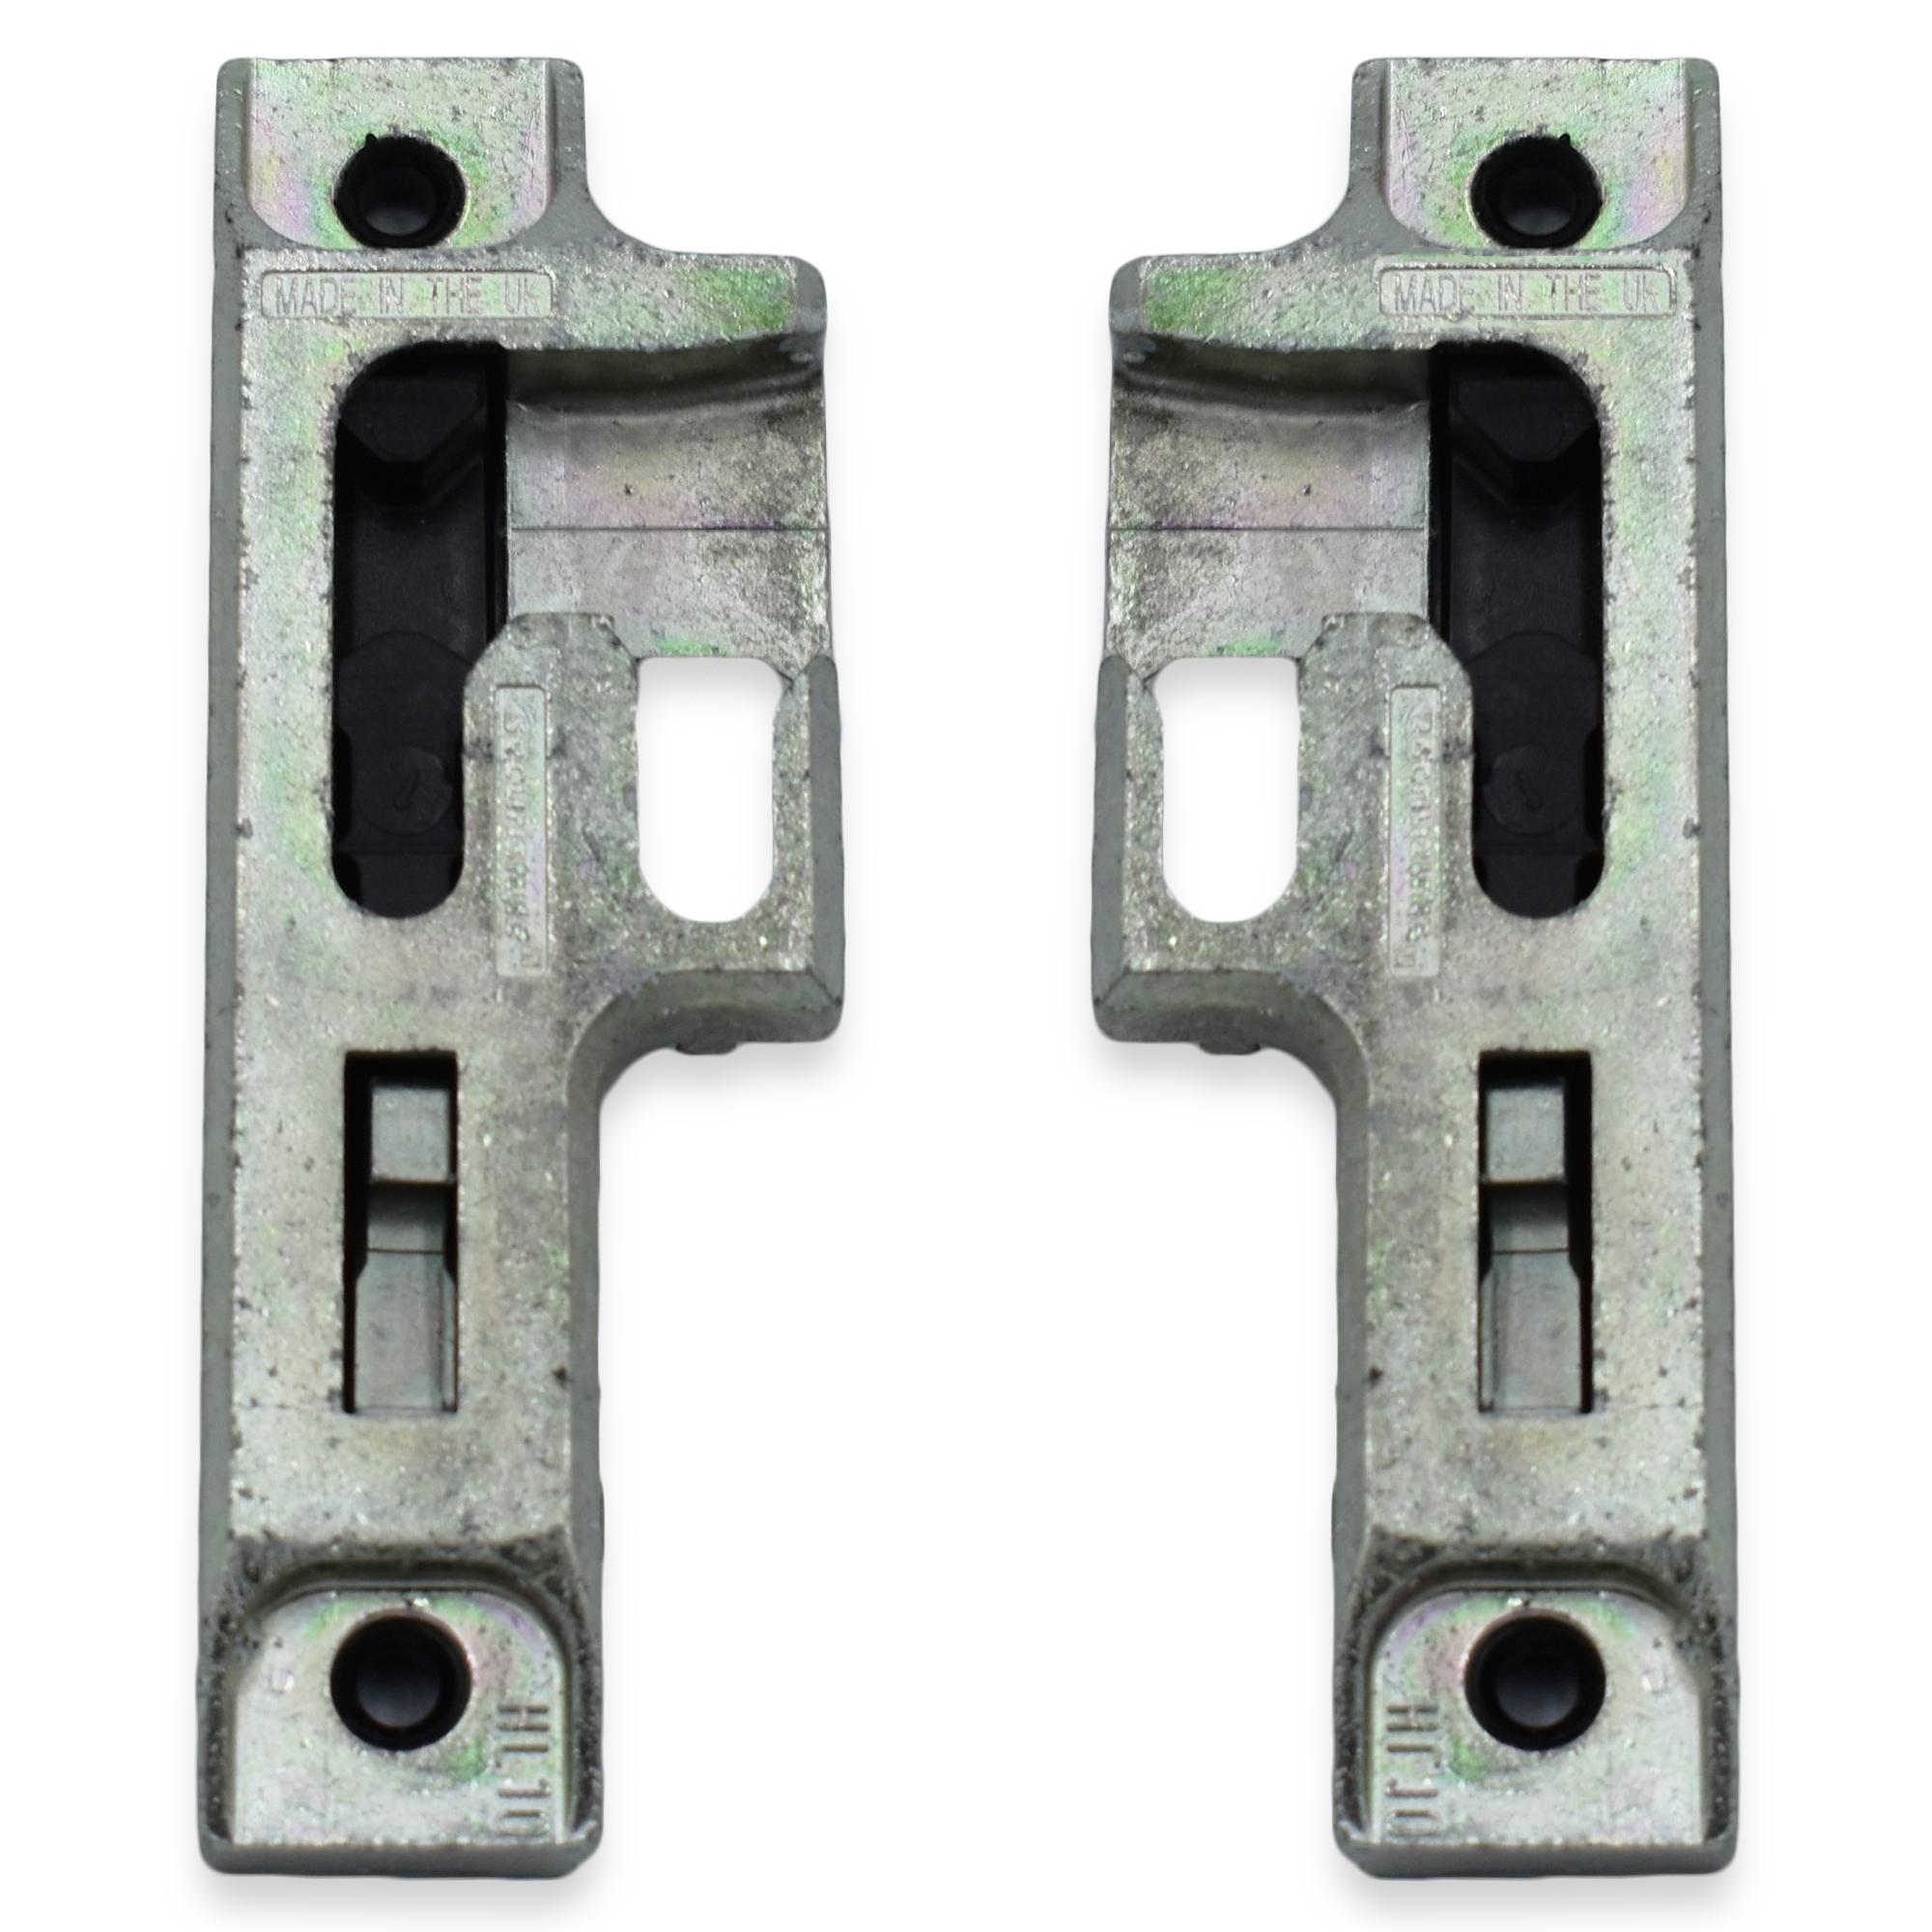 6 x Locksmiths tools for upvc door locks 1st P/&P